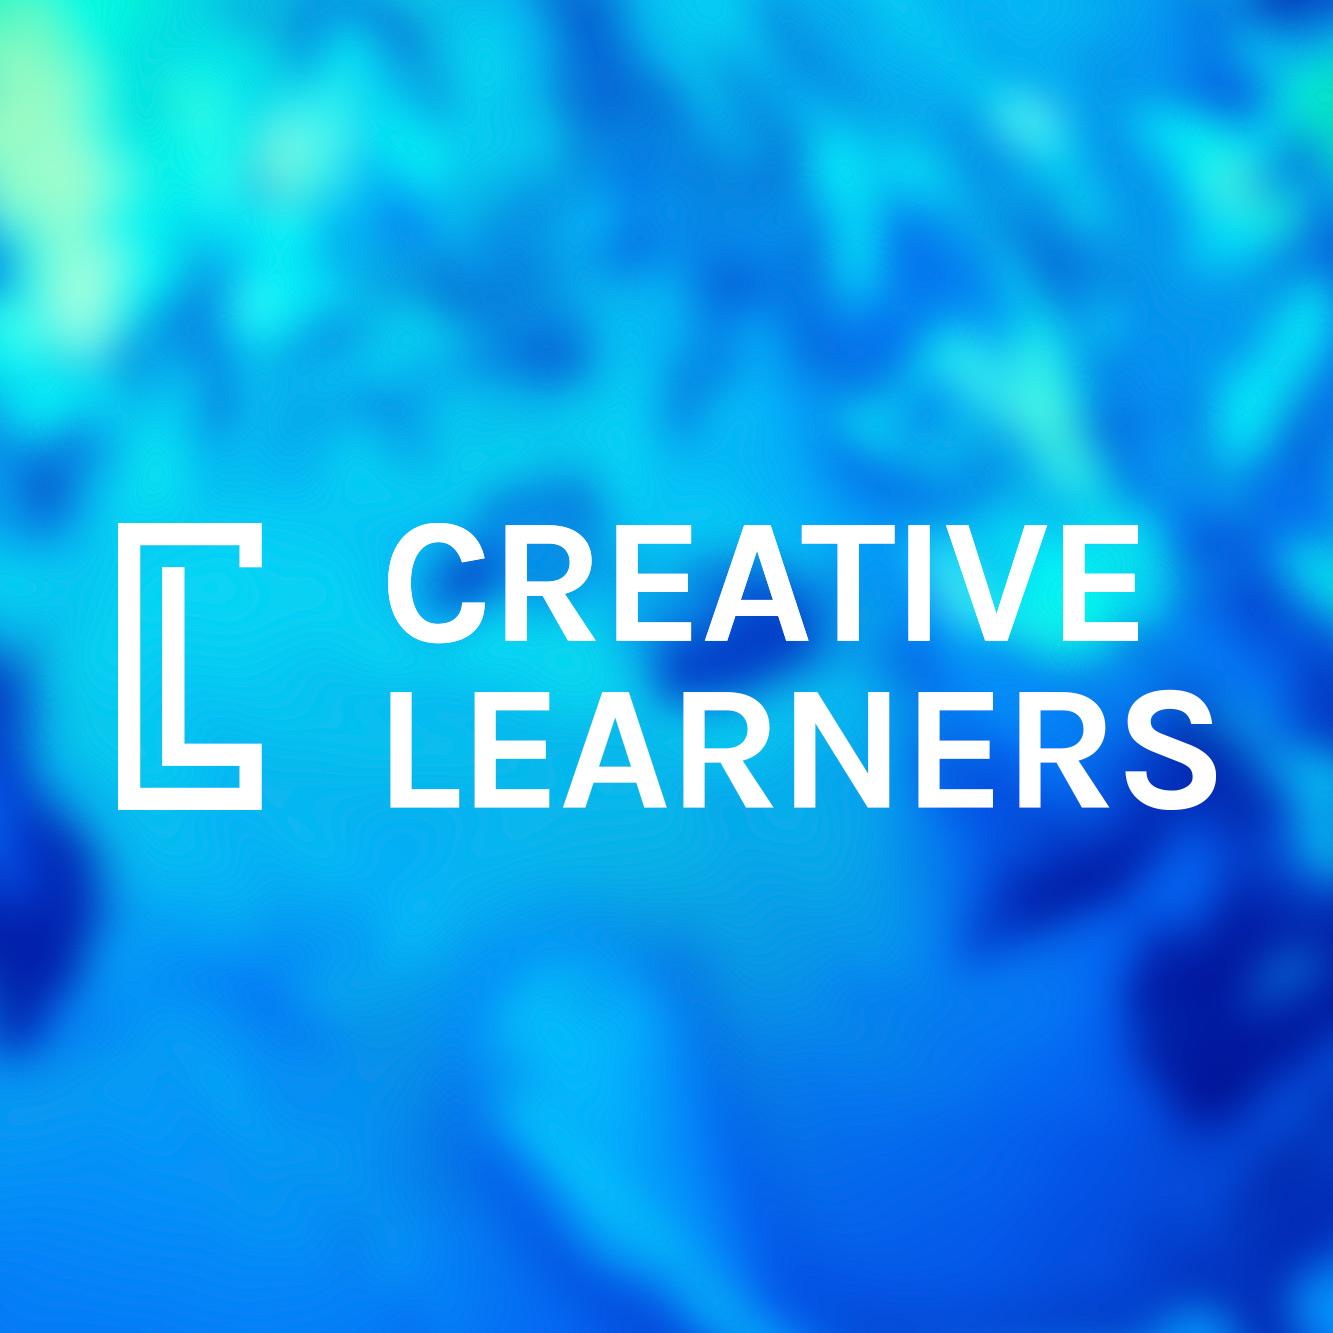 creative-learners-logo-by-also-agency.jpg